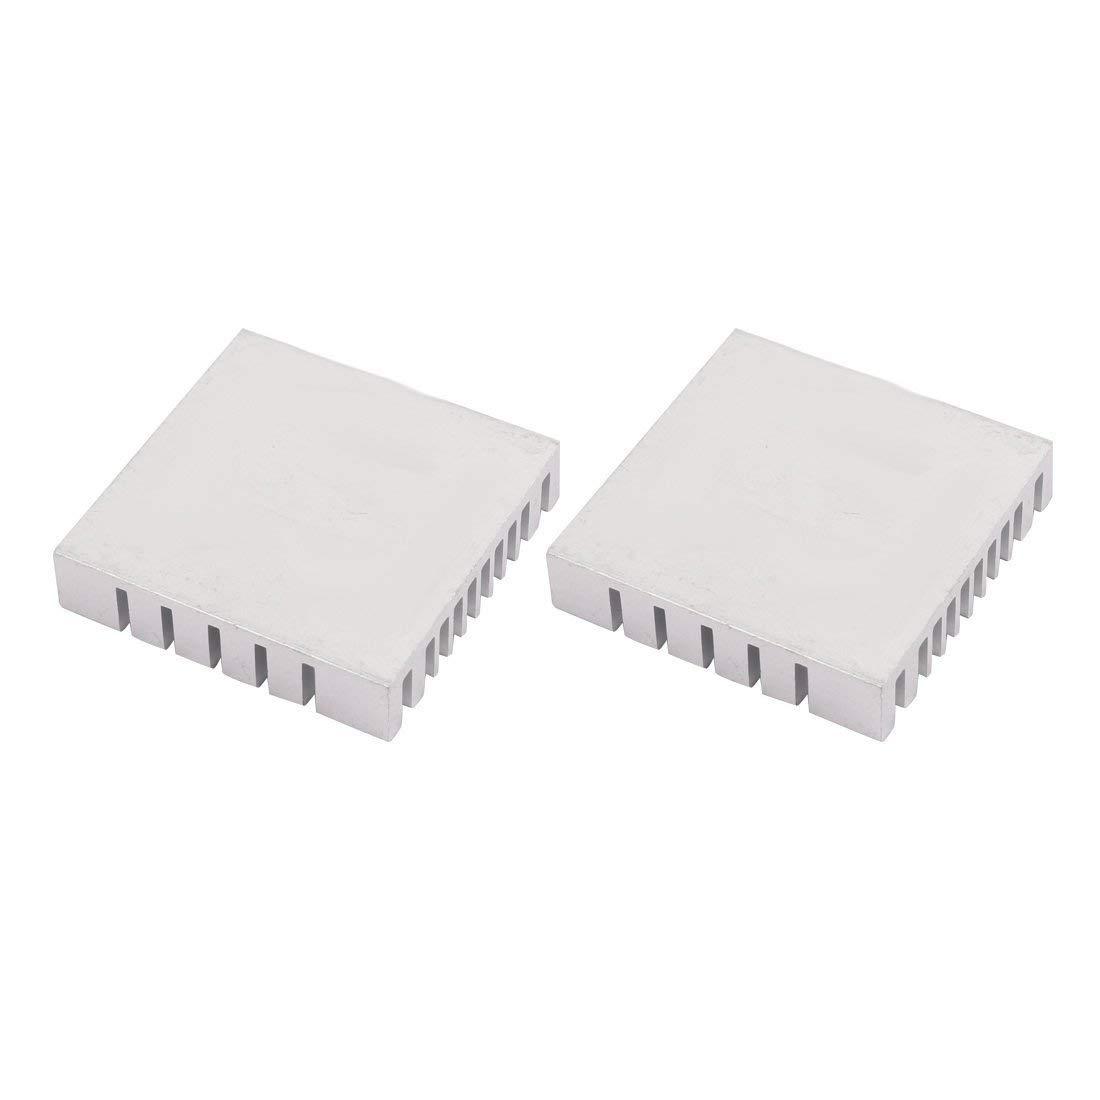 Ucland 2Pcs 40mm x 40mm x 9mm Aluminum Heatsink Heat Diffuse Cooling Fin Silver Tone